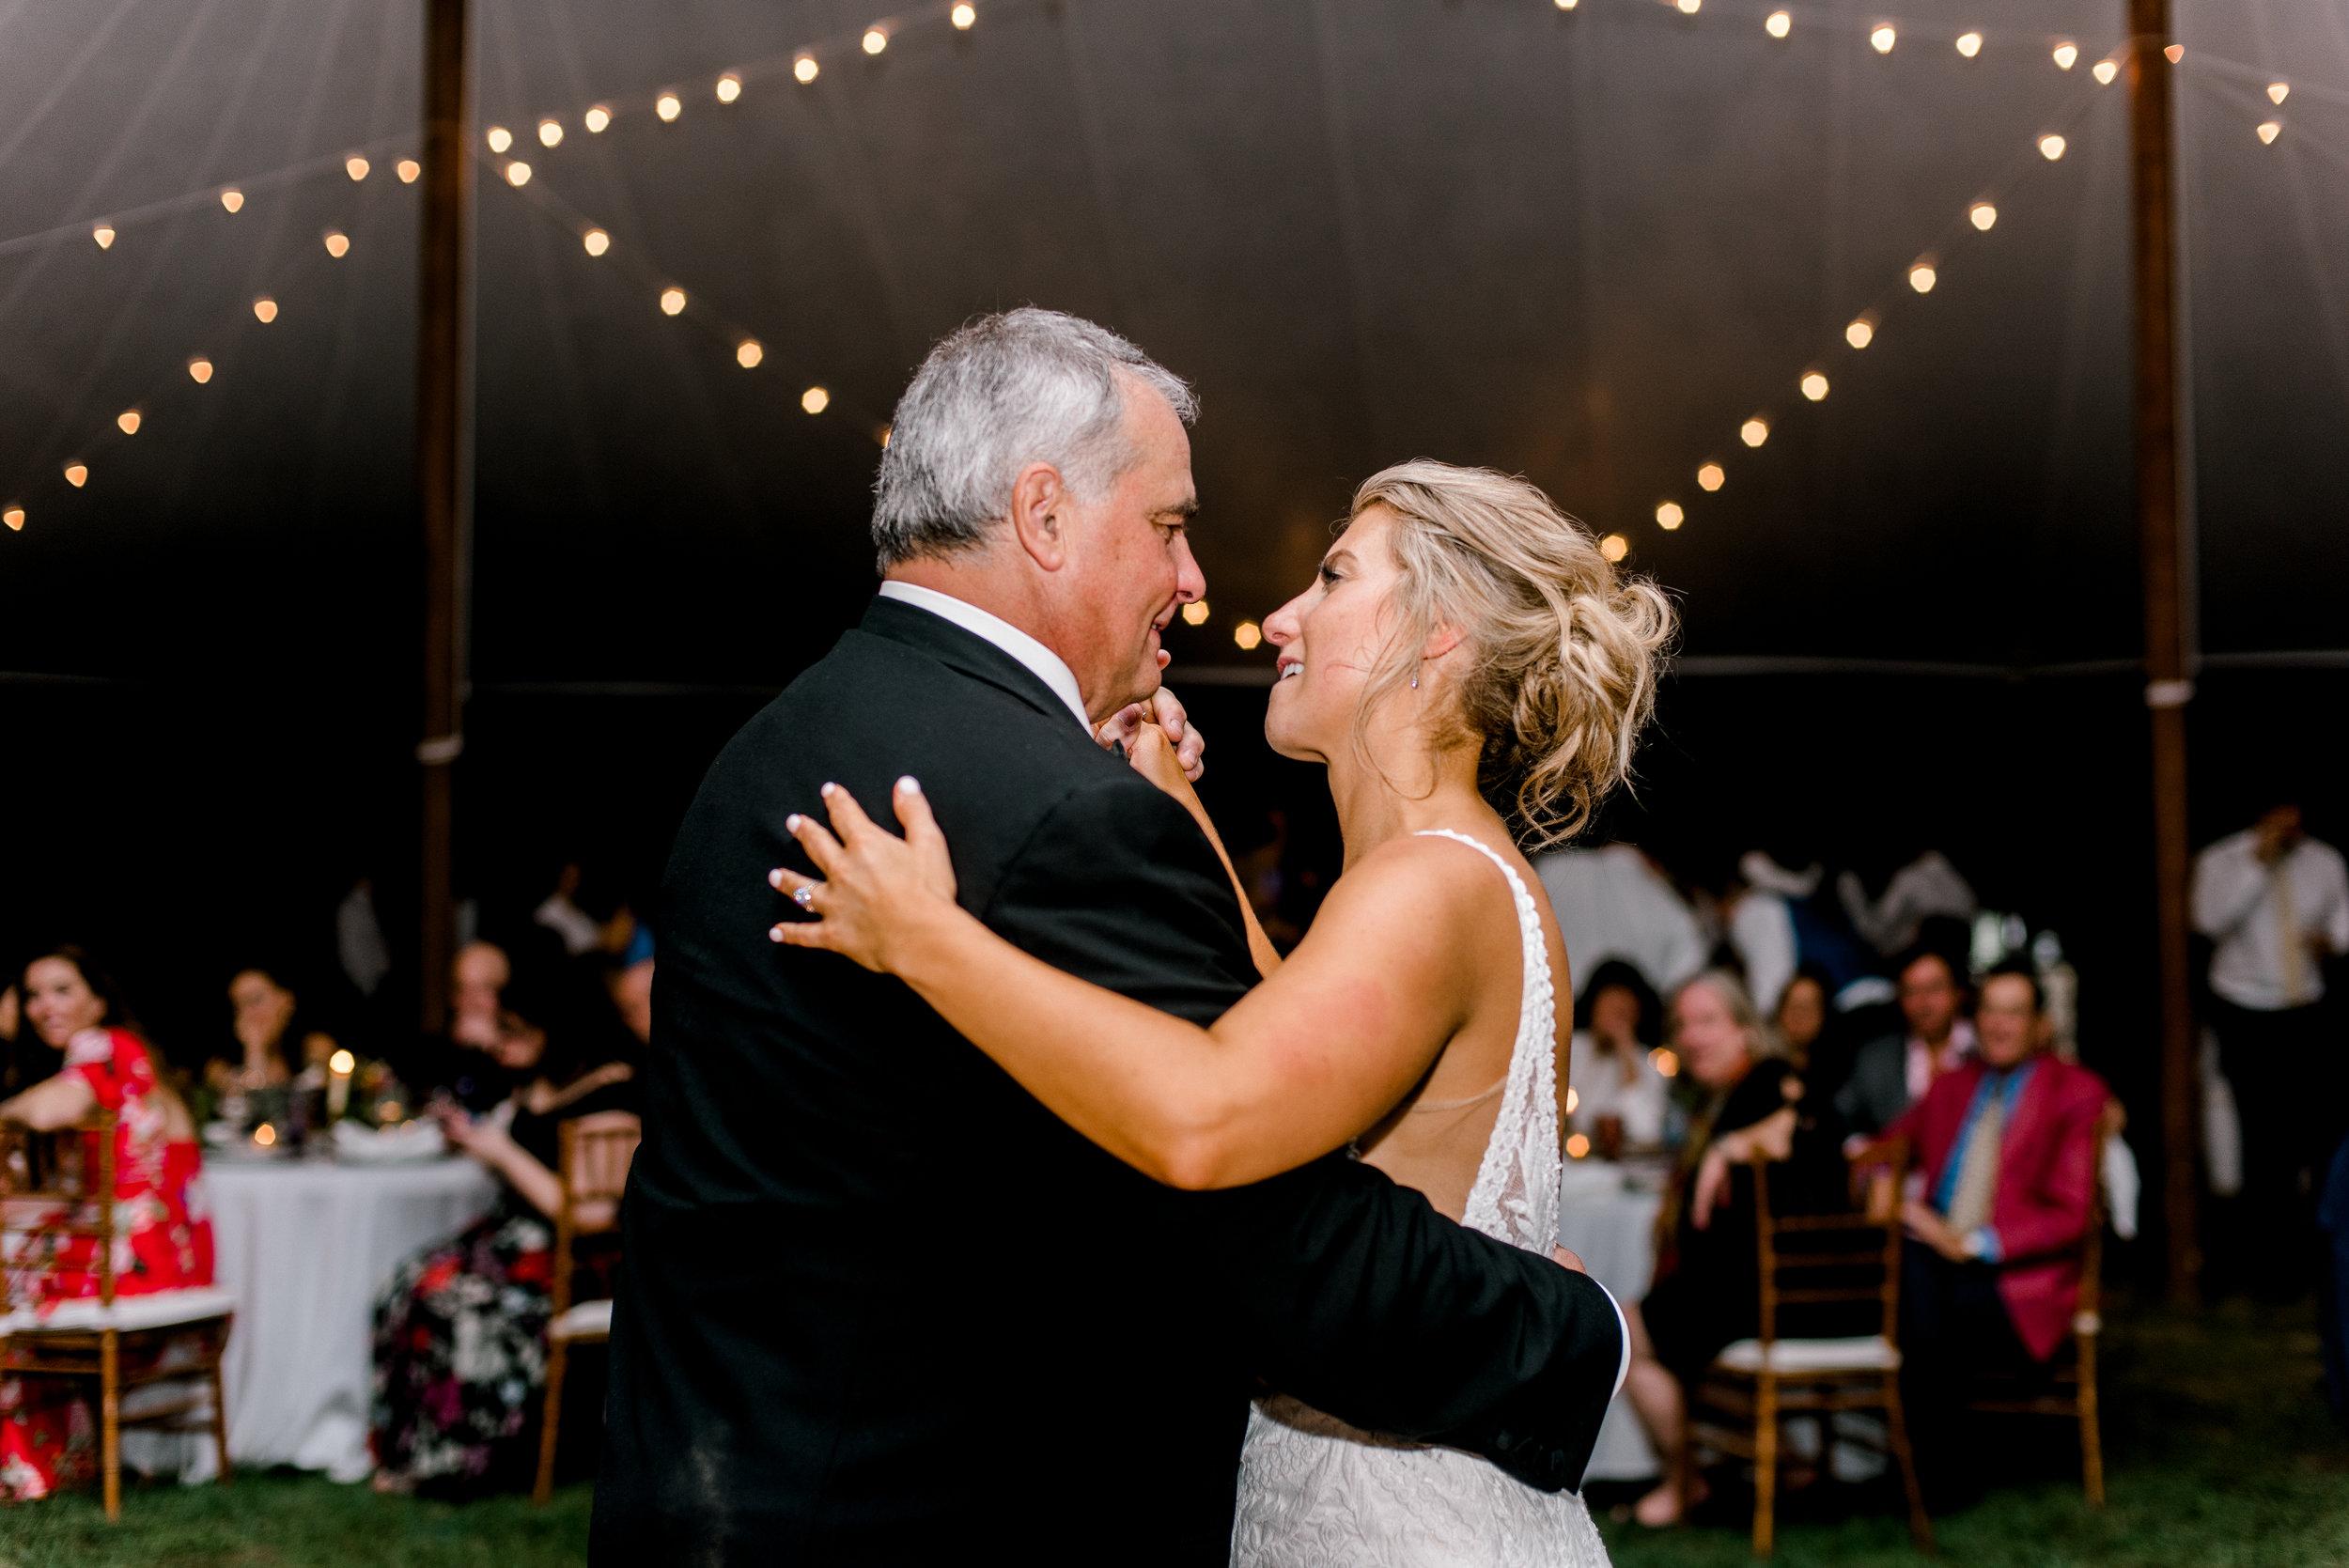 Nicole and Dad